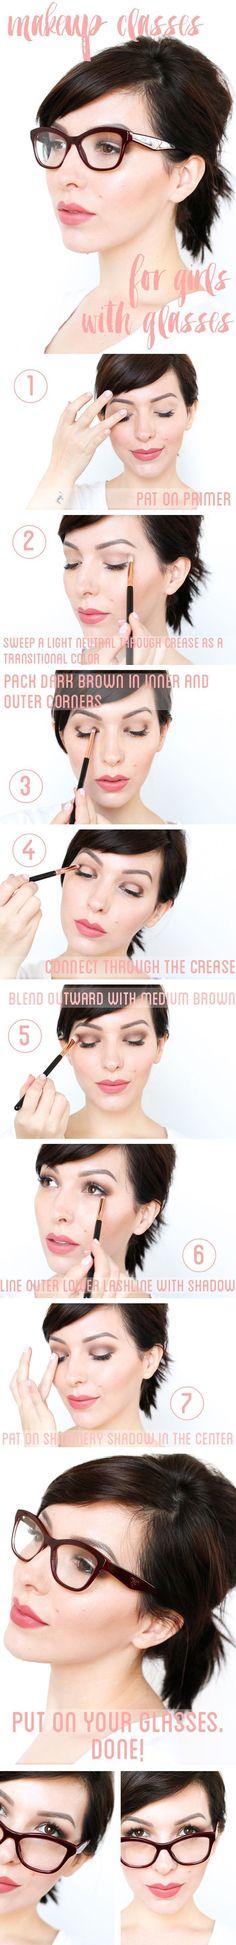 Beauty // Beautiful makeup tutorial if you'we wearing glasses.